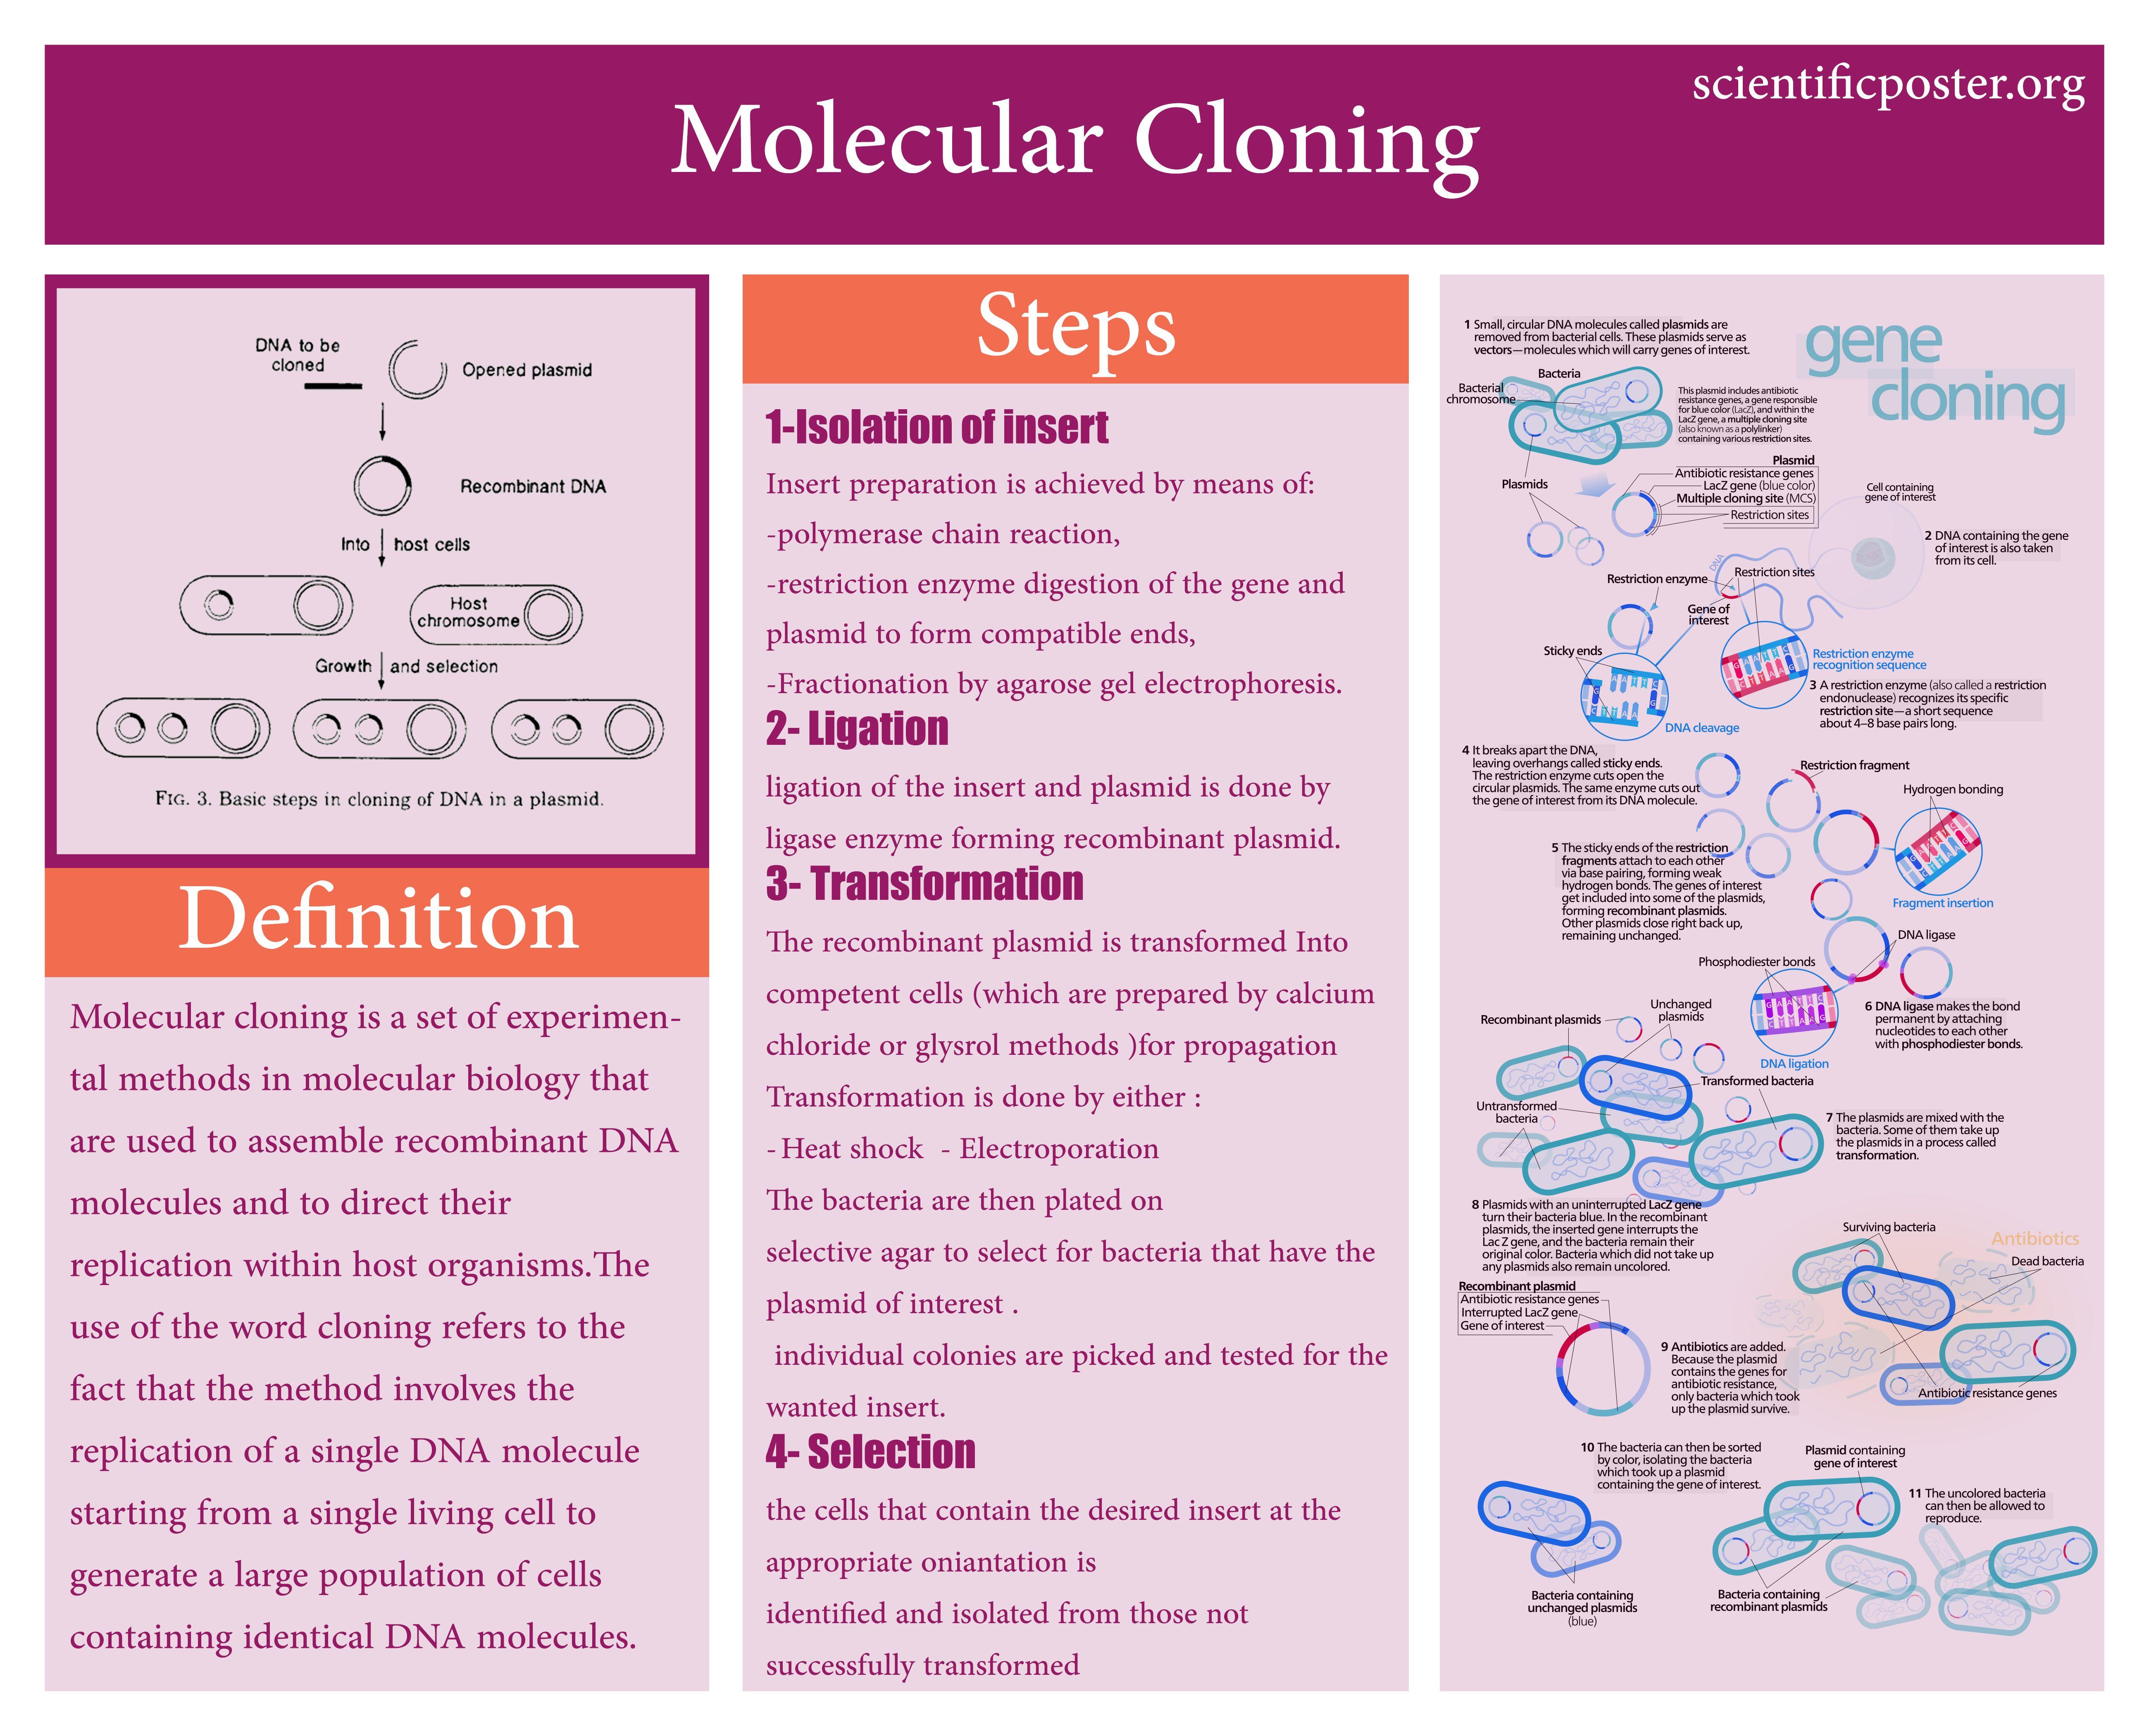 Scientific Poster Sample | Scientific Posters Samples | Pinterest ...